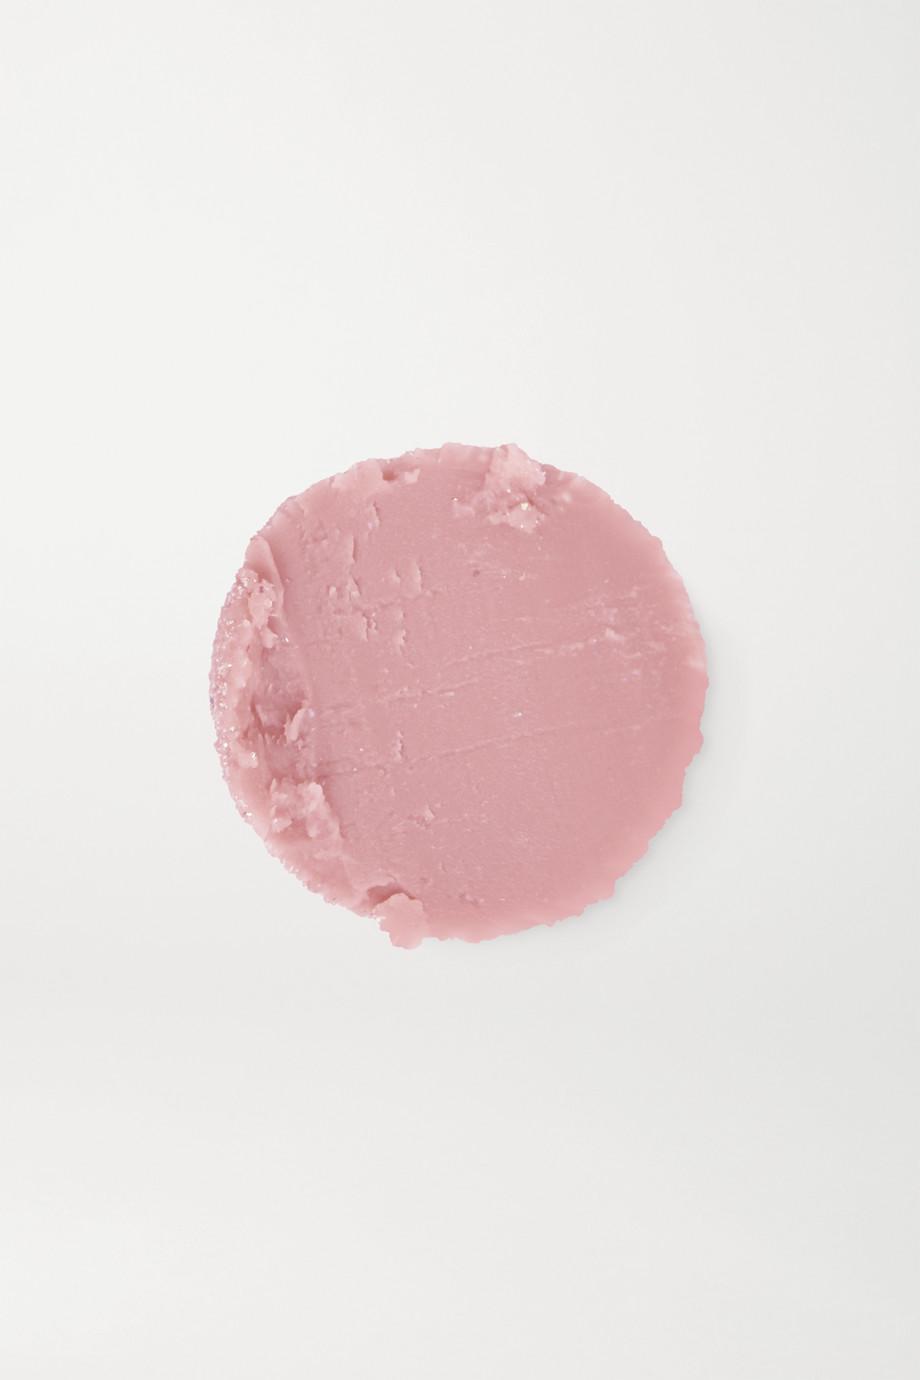 Huda Beauty Diamond Lip Balm - Negligee